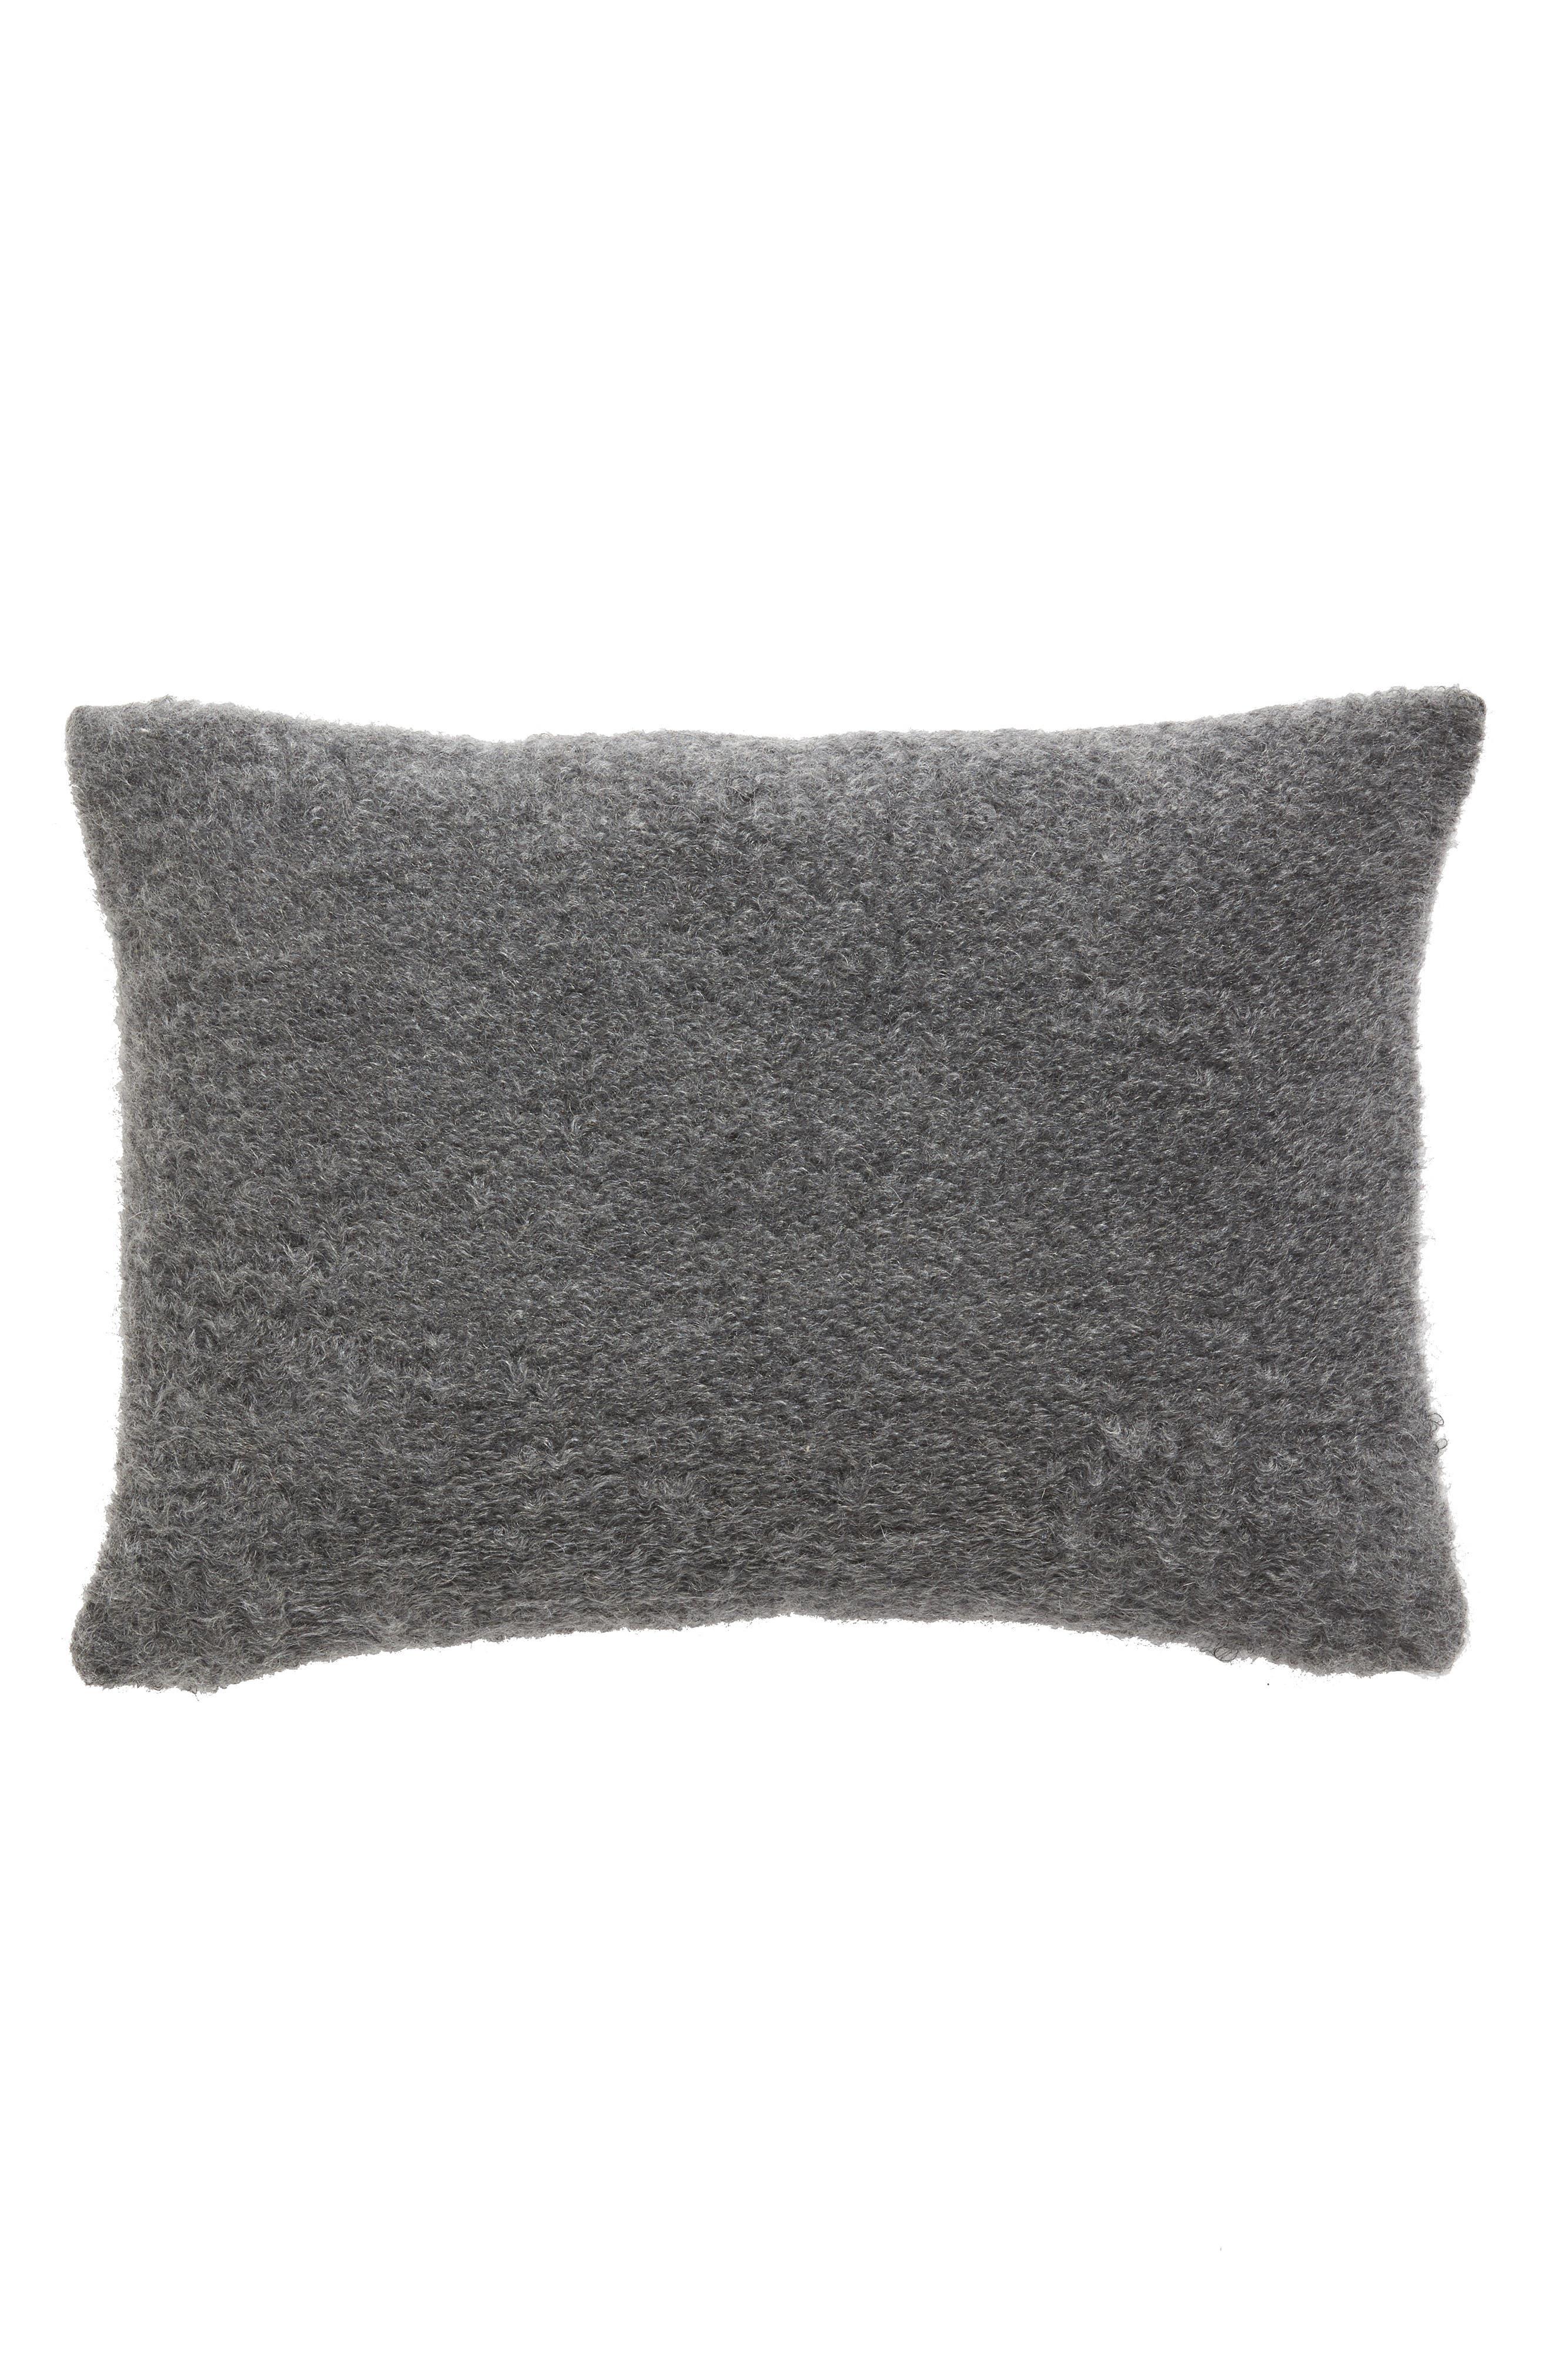 Collio Pillow,                             Main thumbnail 1, color,                             GRAPHITE